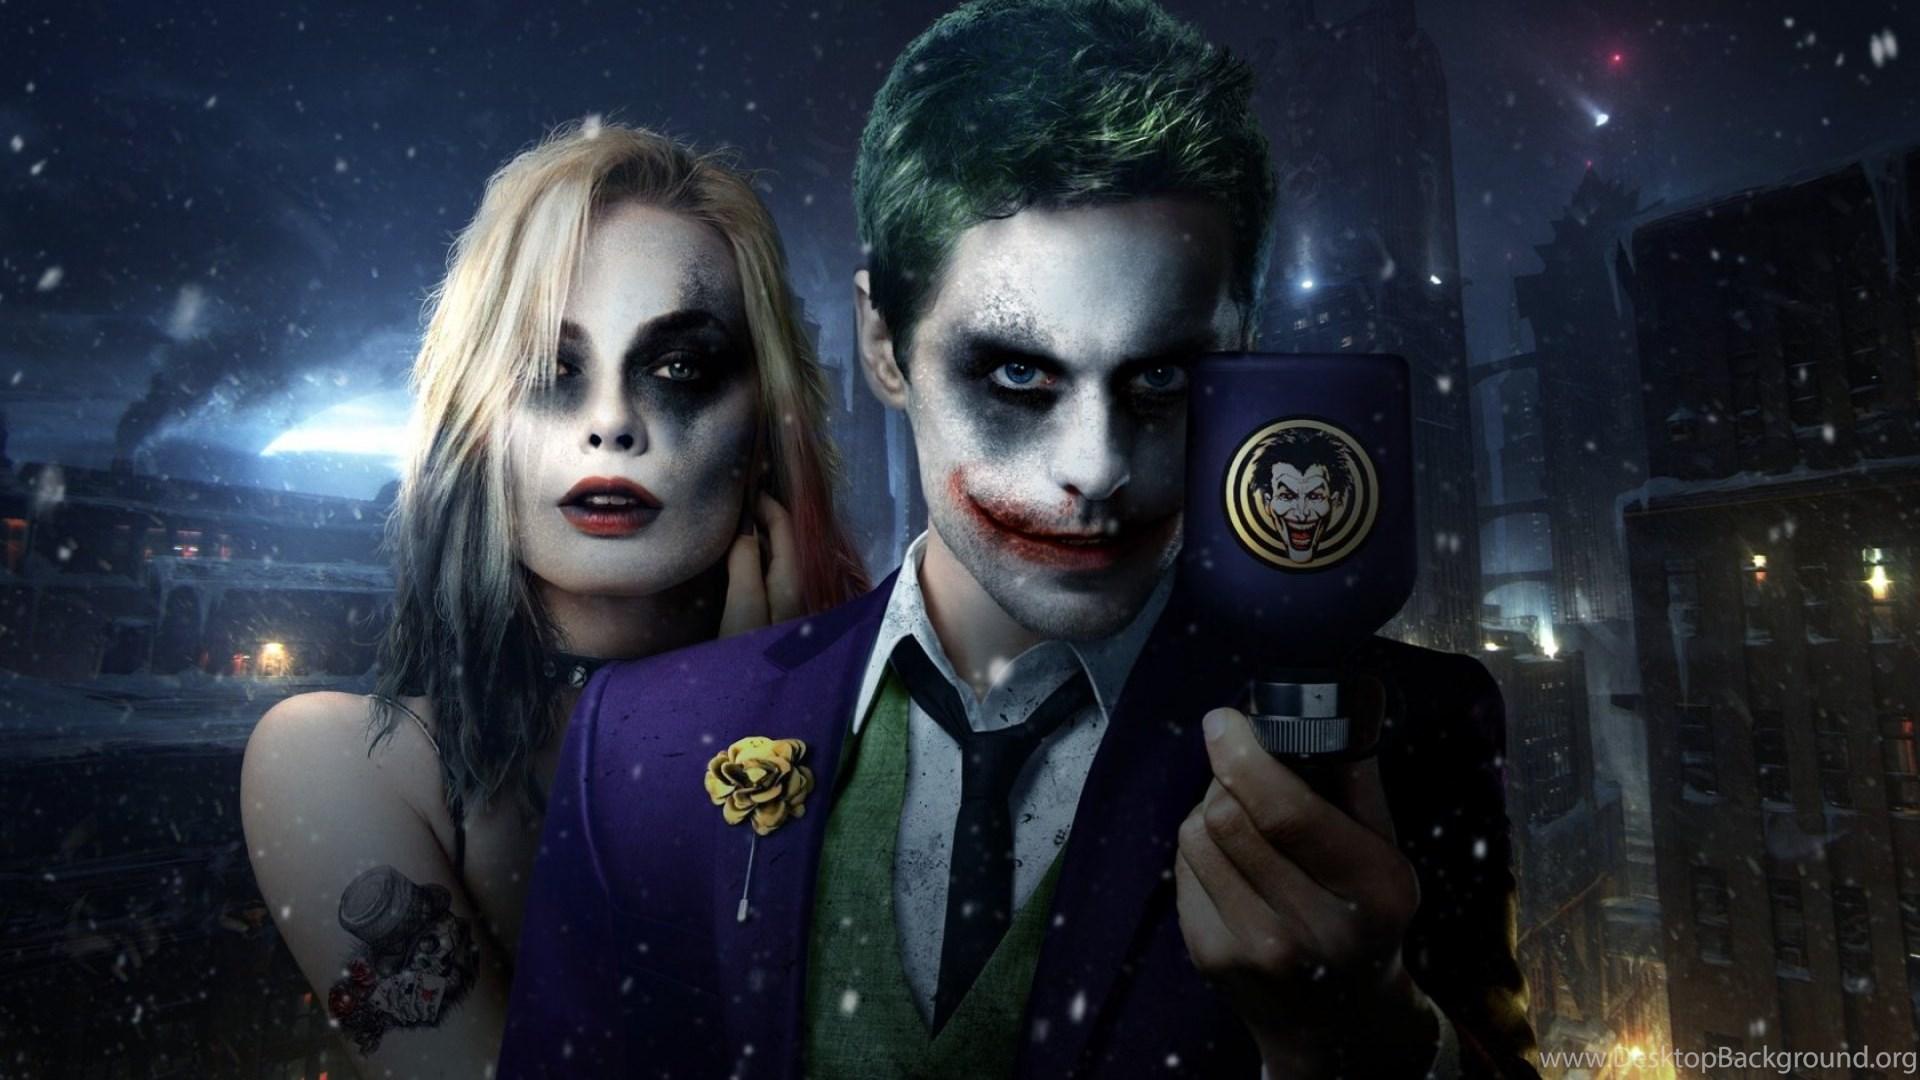 Suicide Squad 2016 Joker And Harley Quinn Wallpapers Desktop